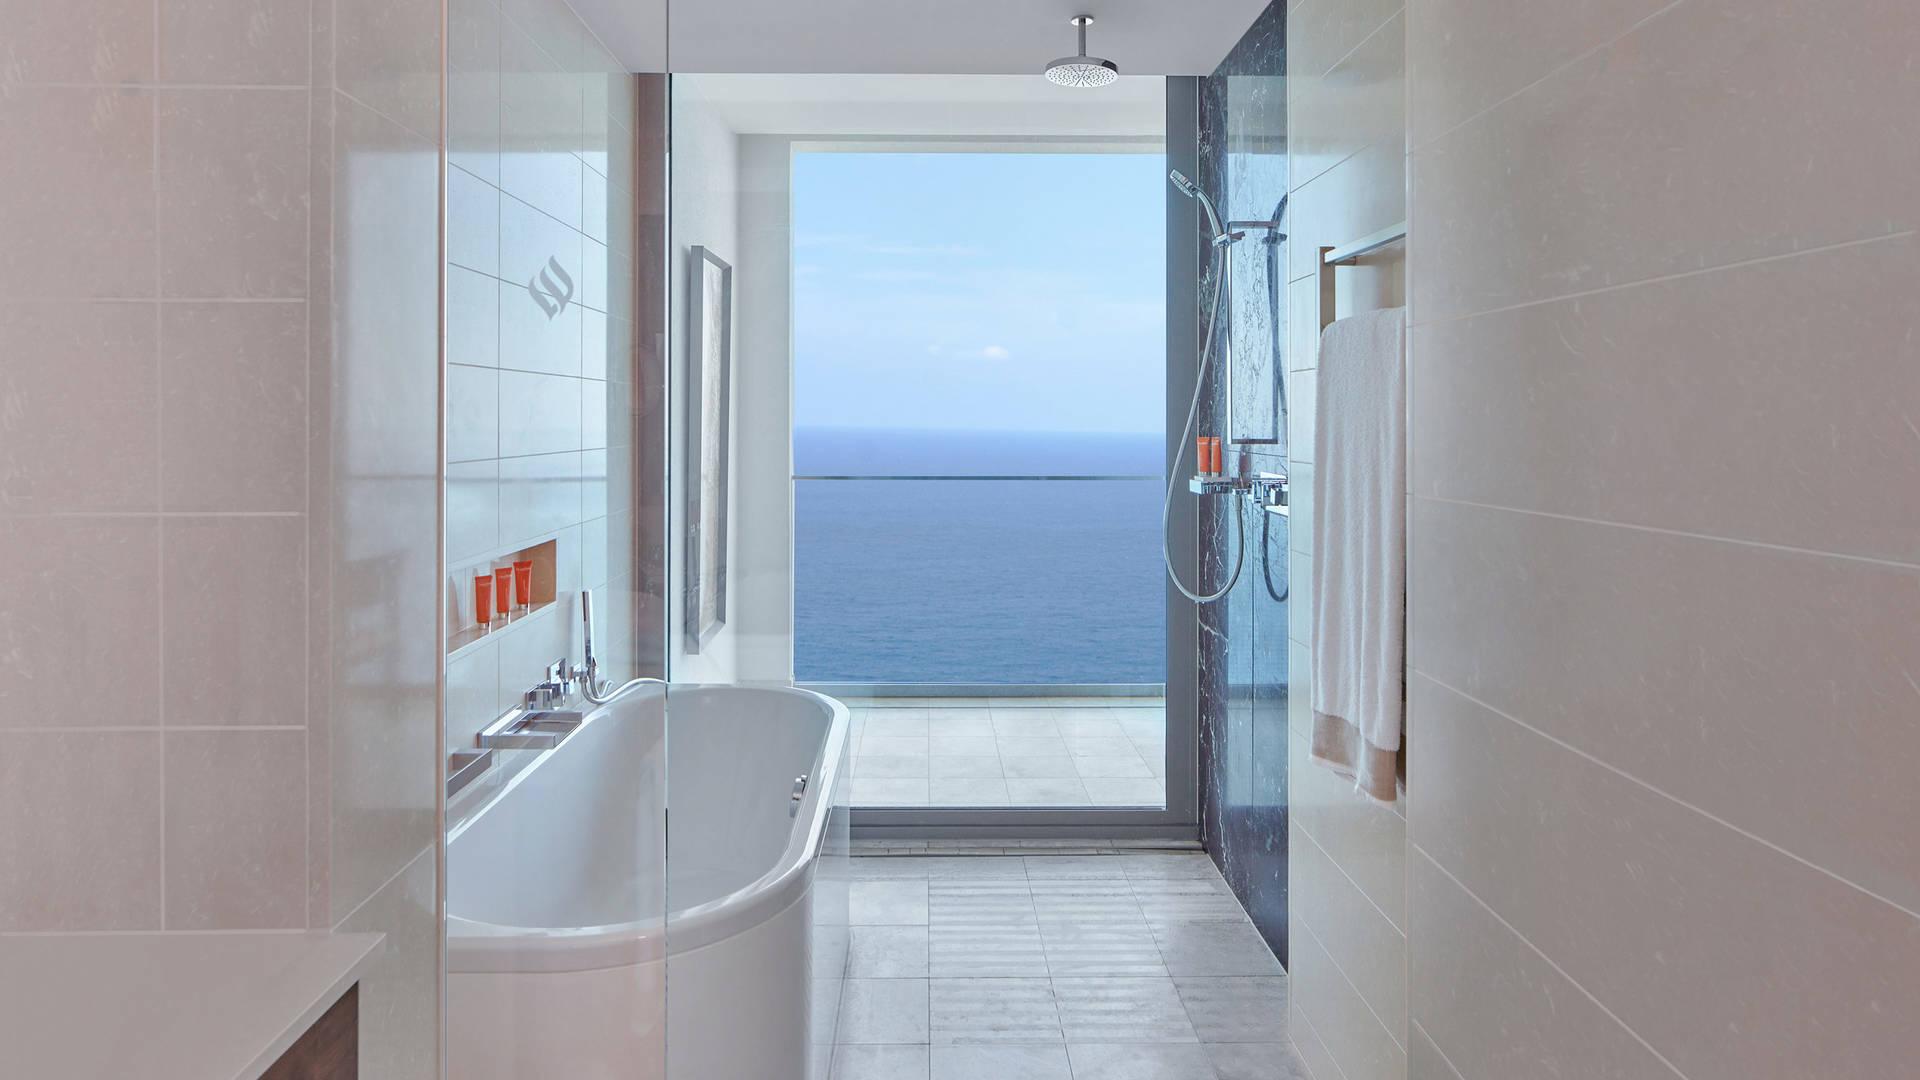 Jumeirah bathroom views port soller_16-9